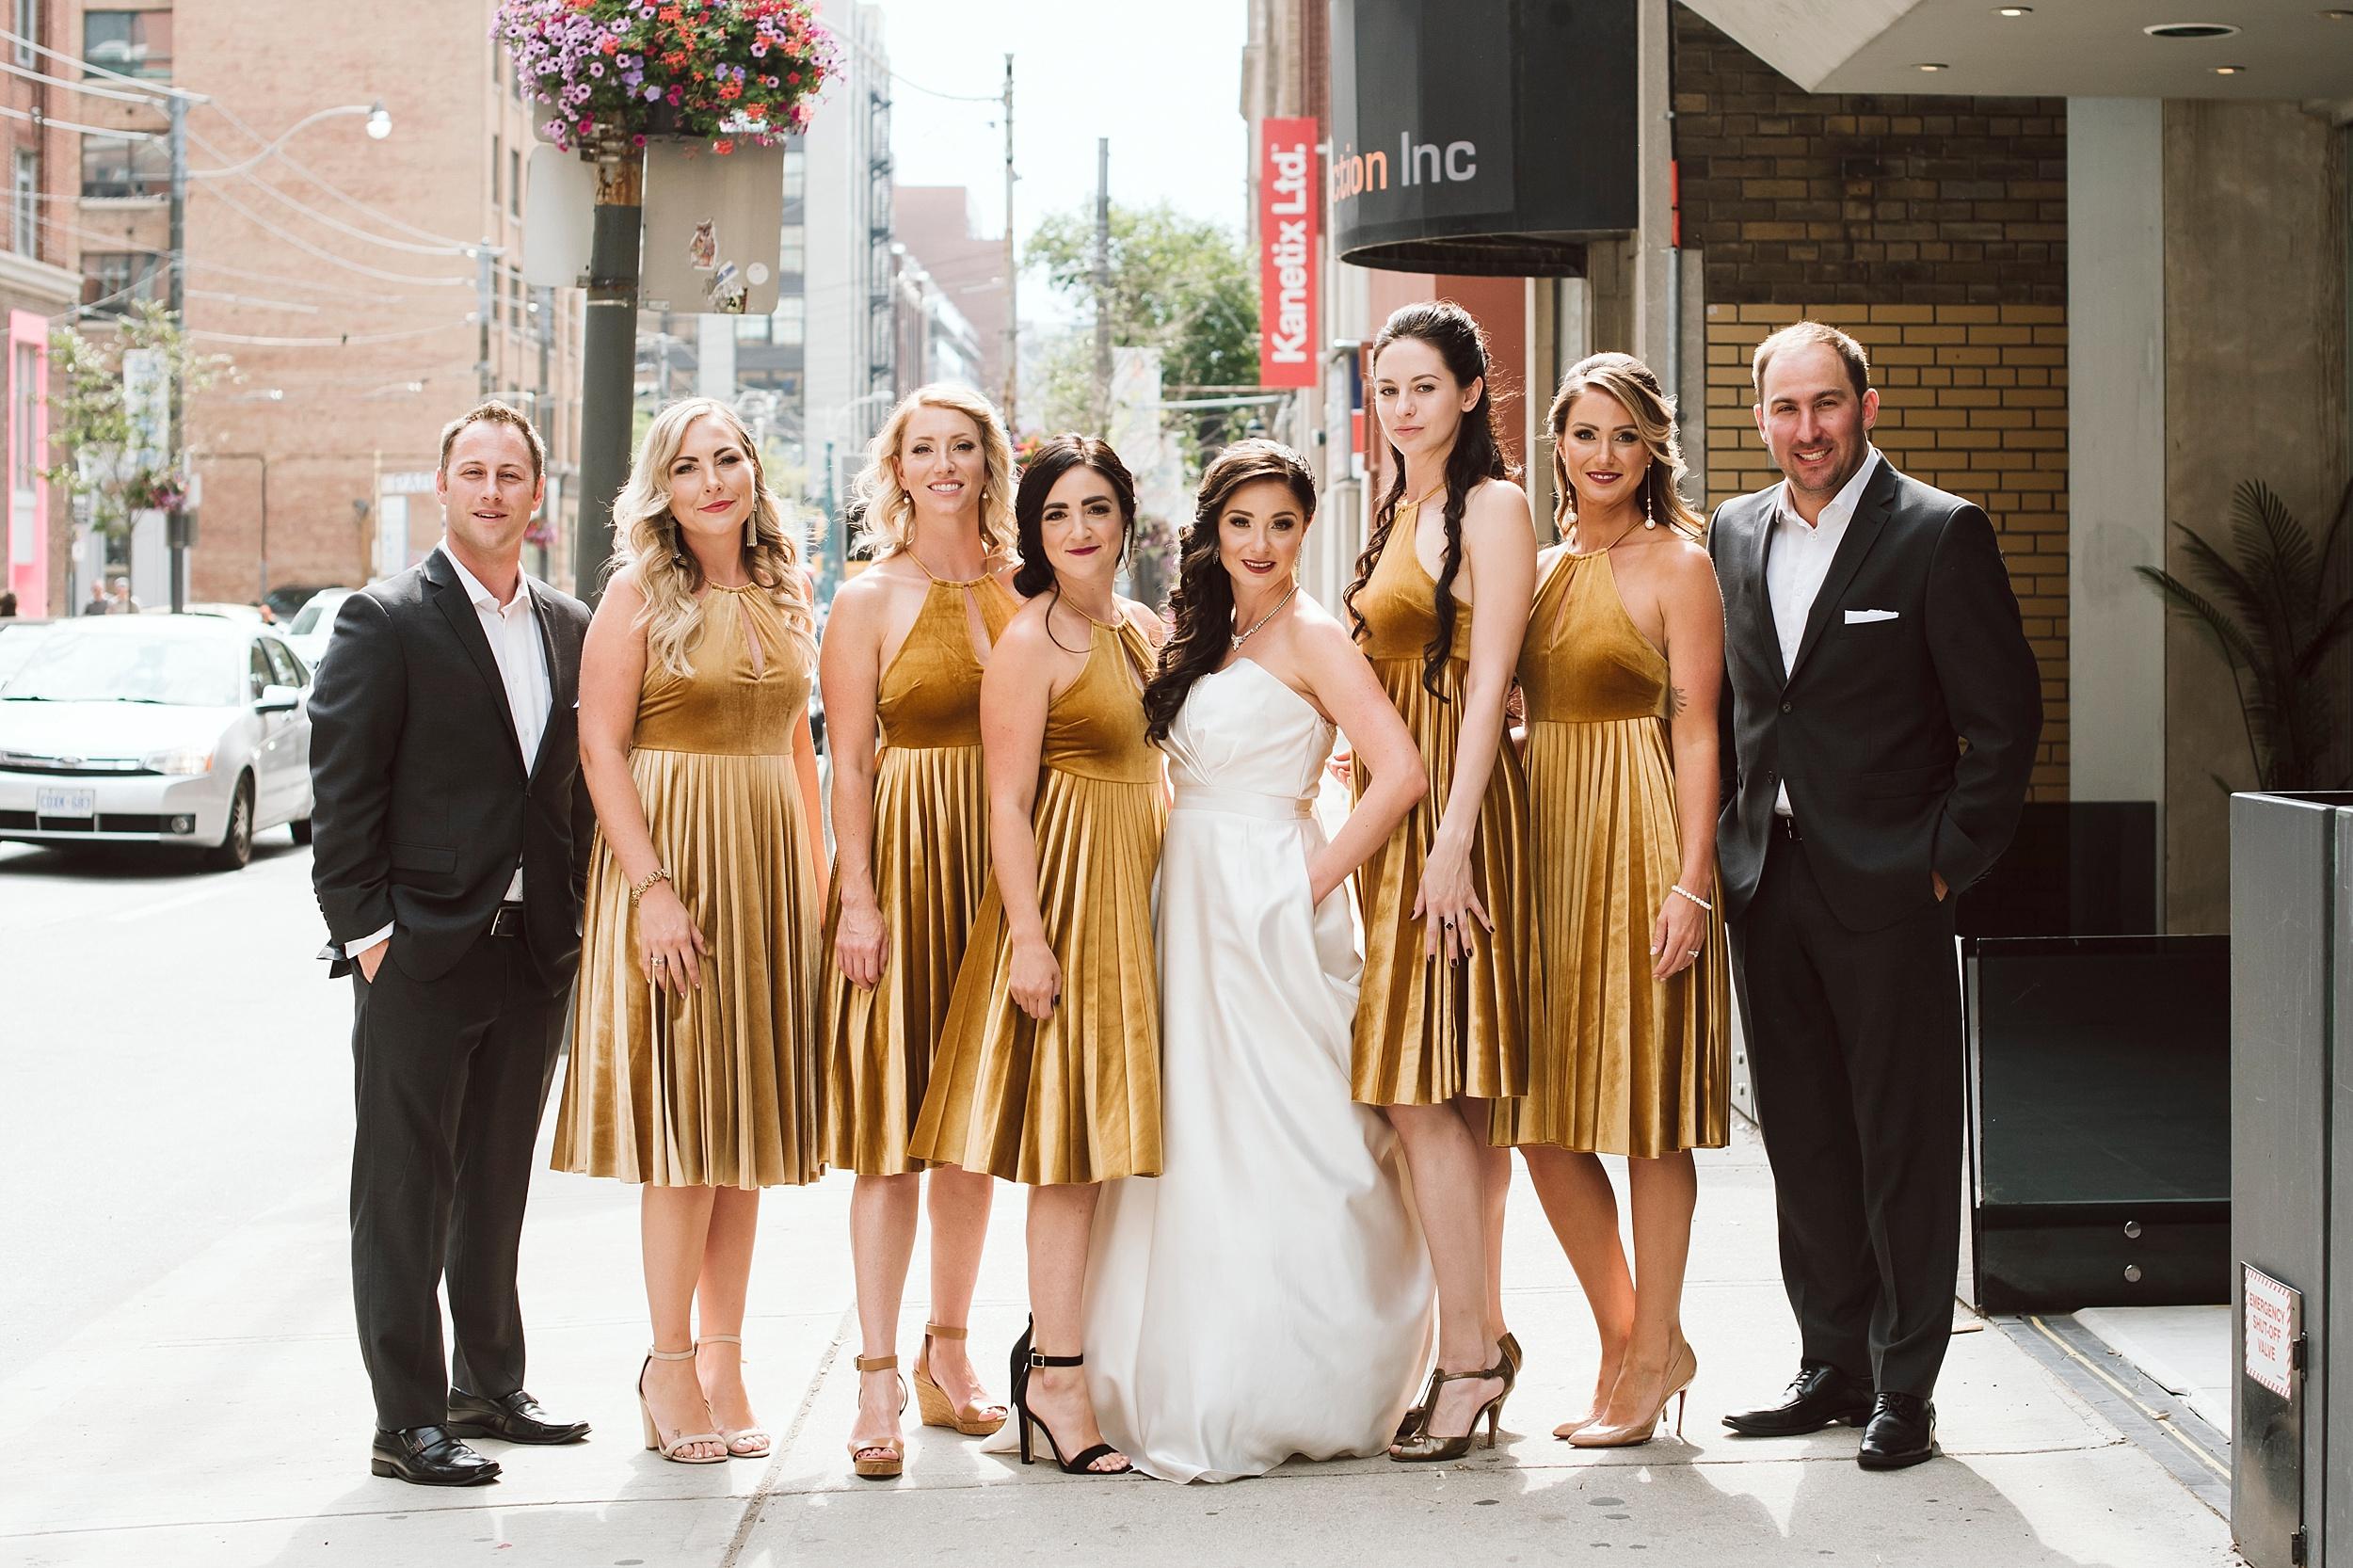 Sunnyside_Pavilion_Wedding_Toronto_Photographer_0011.jpg